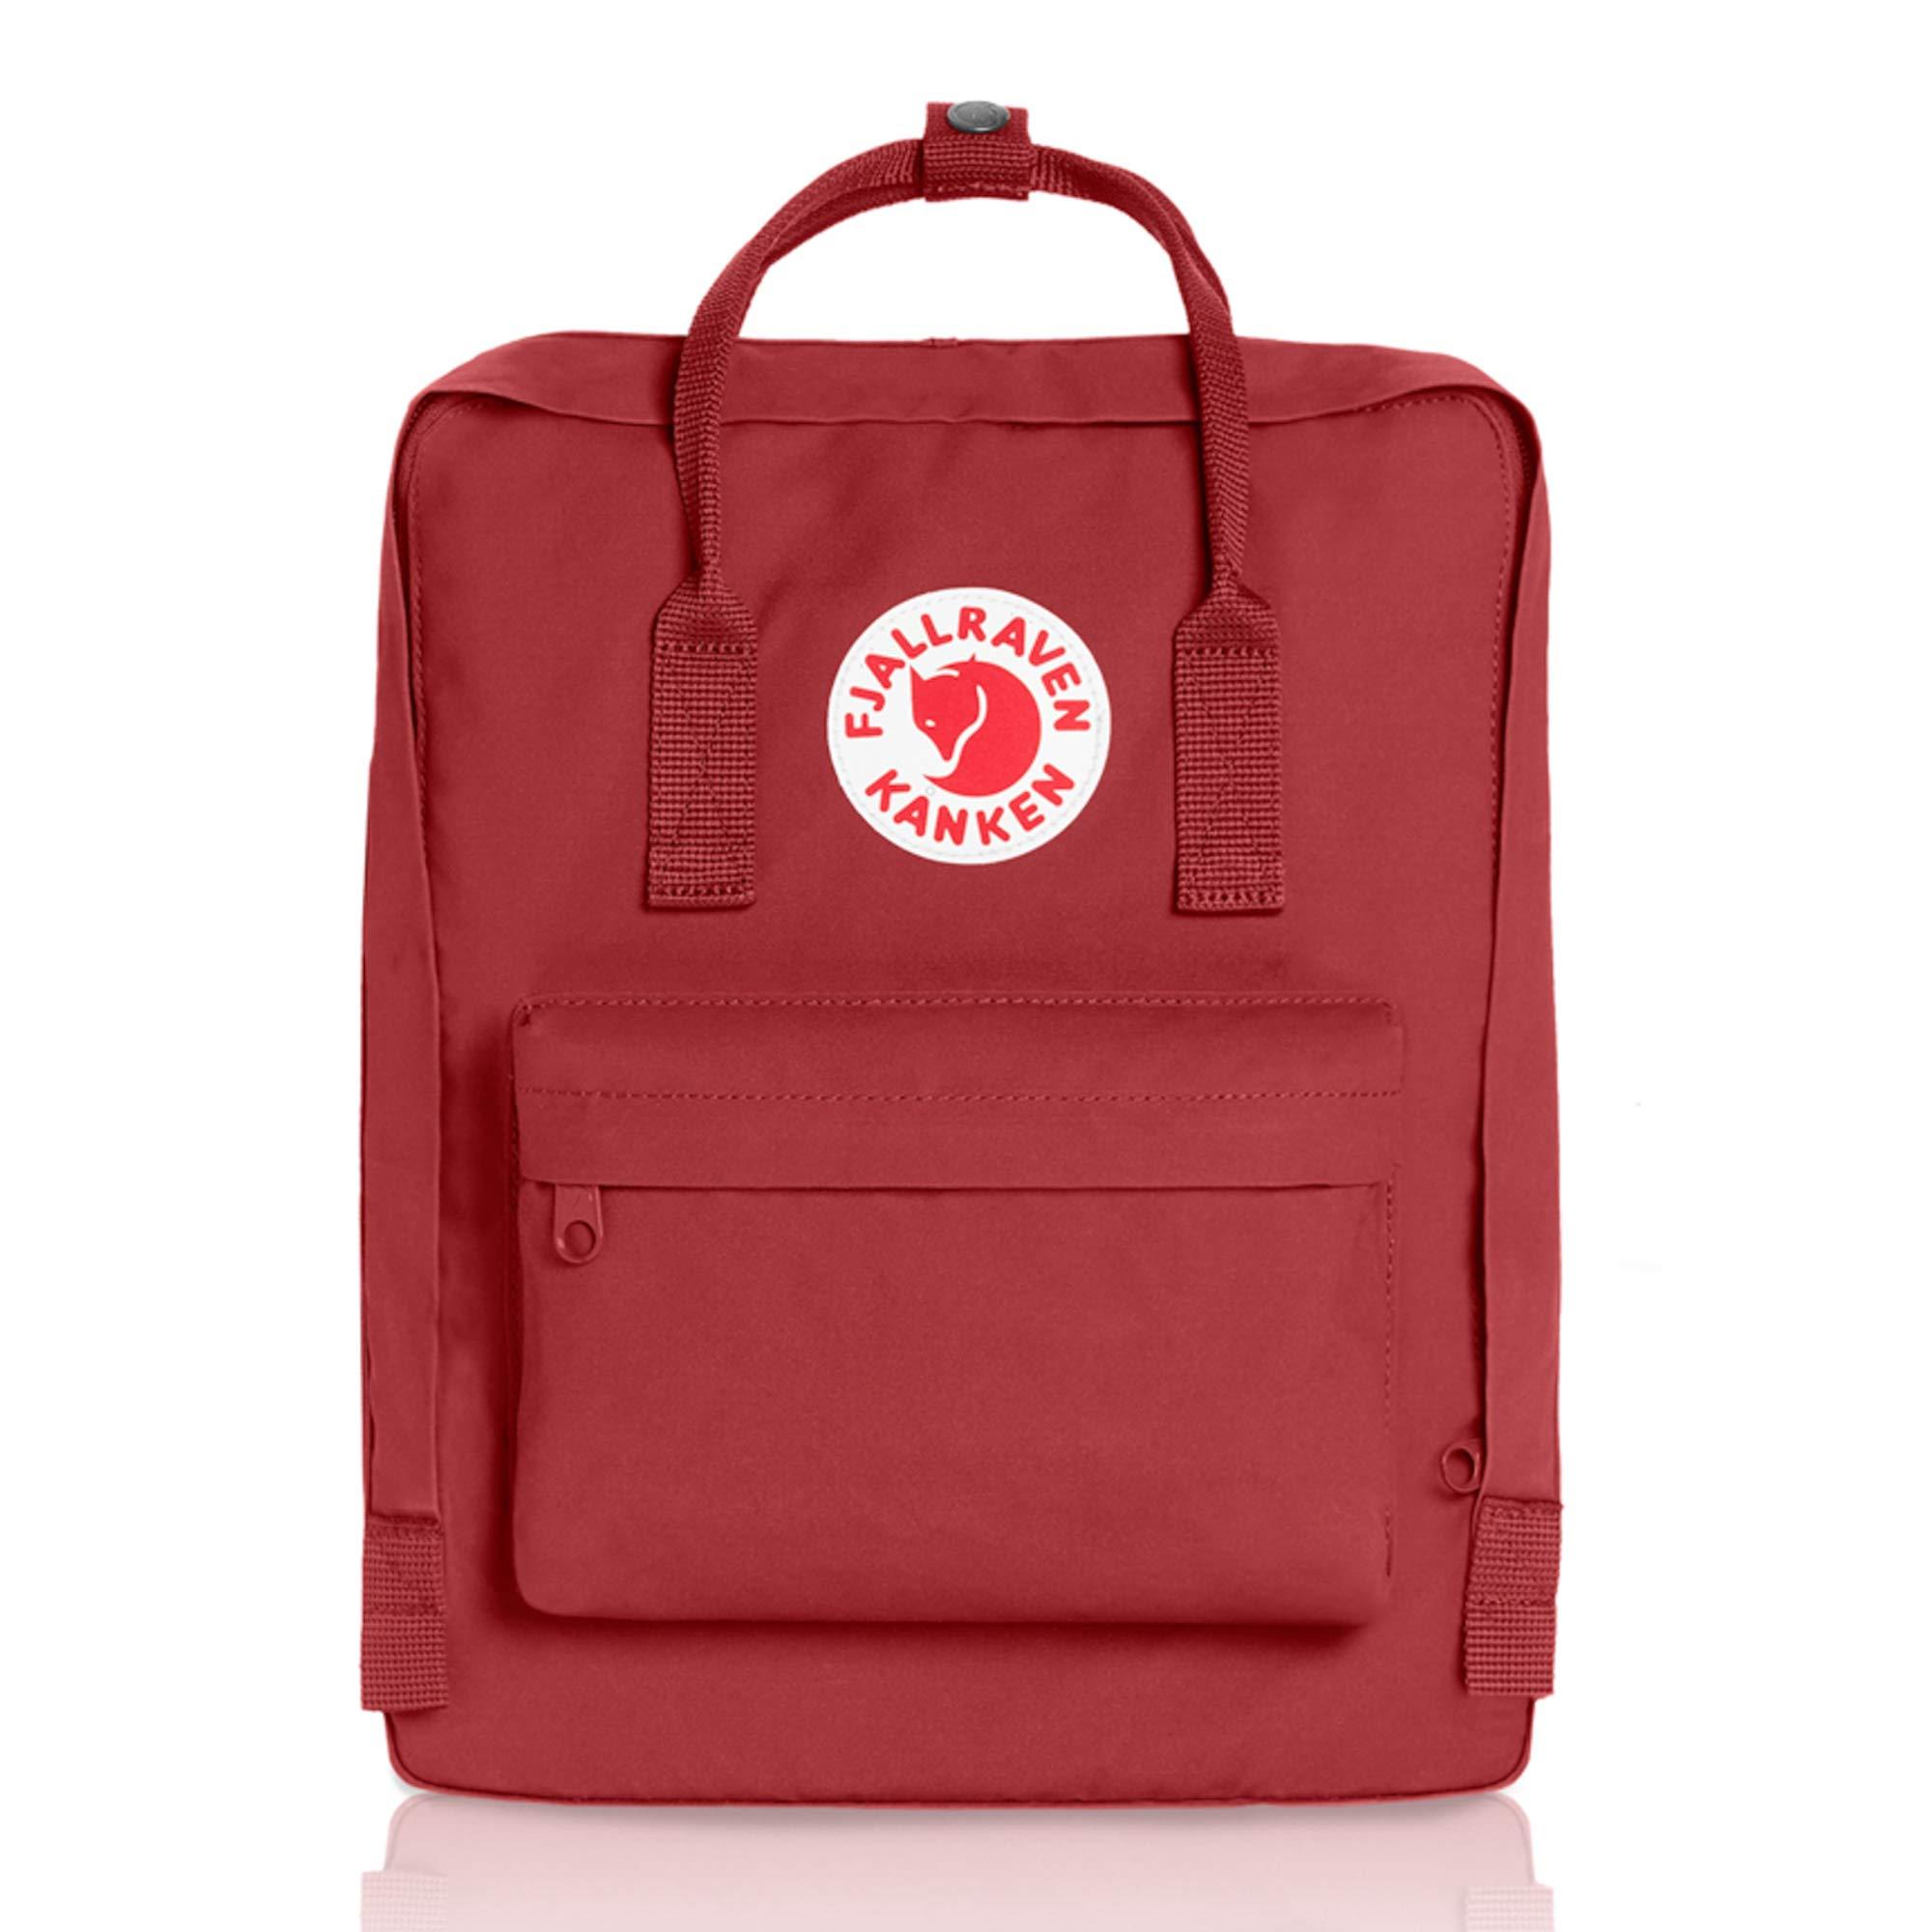 Fjallraven - Kanken Classic Backpack for Everyday, Deep Red